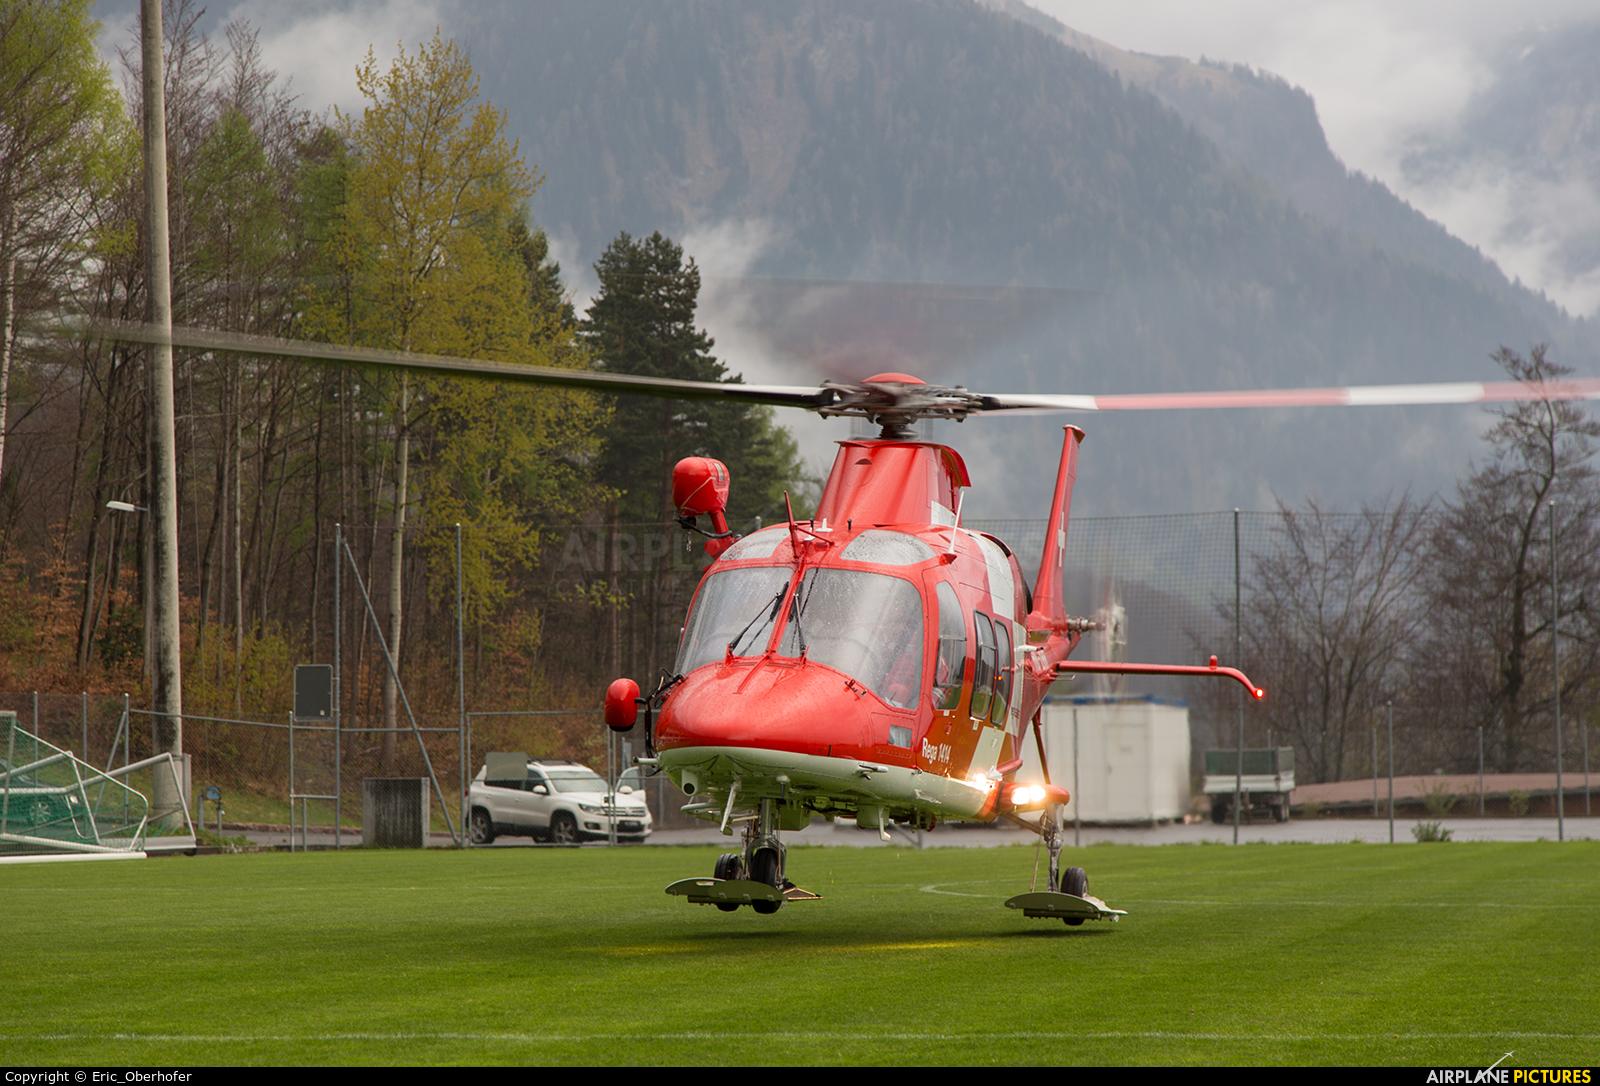 REGA Swiss Air Ambulance  HB-ZRR aircraft at Off Airport - Swiss Alps